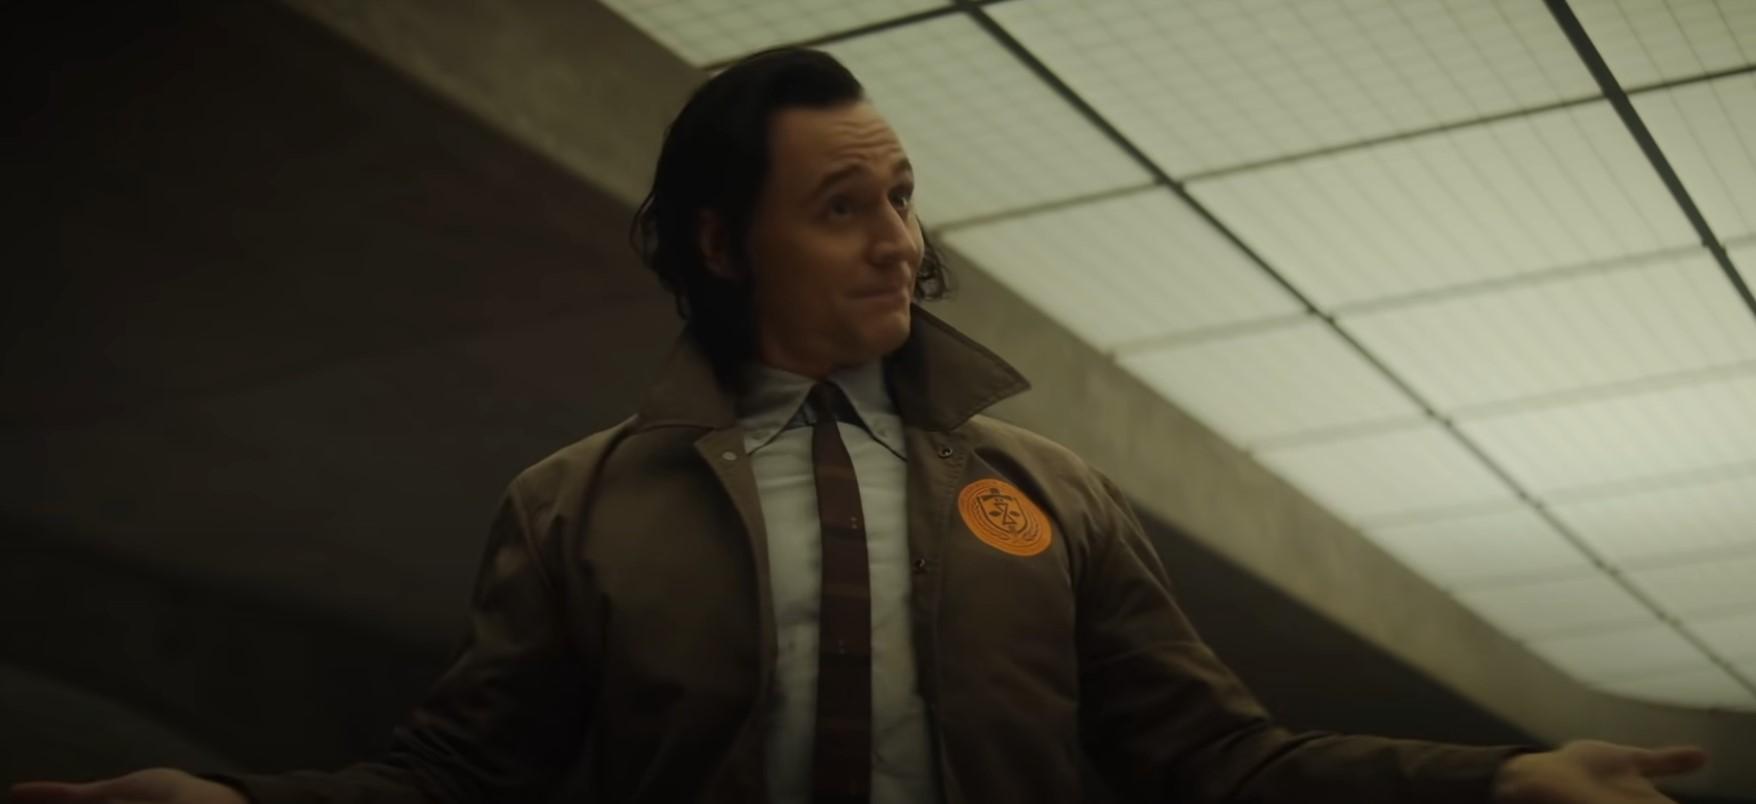 Loki Episode 6 Full Episode Watch Online For Free | Also Episode 5 Recap!